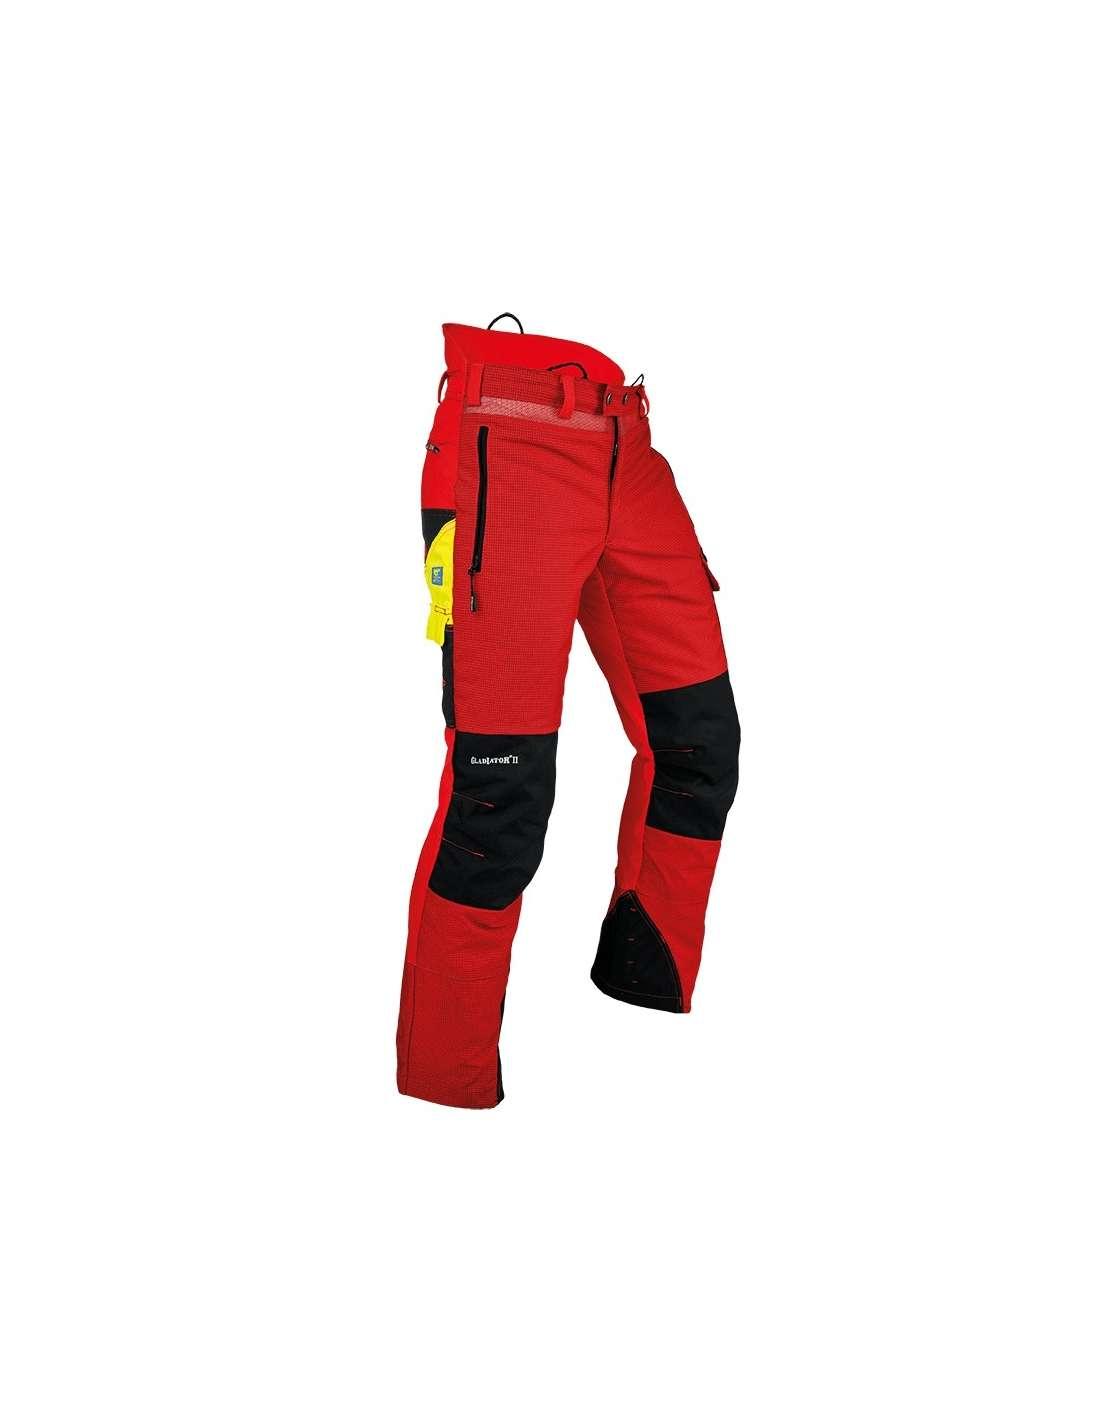 6fd8830336c Pantalones Pfanner Gladiator Anticorte para Motosierras (Clase 2 ...